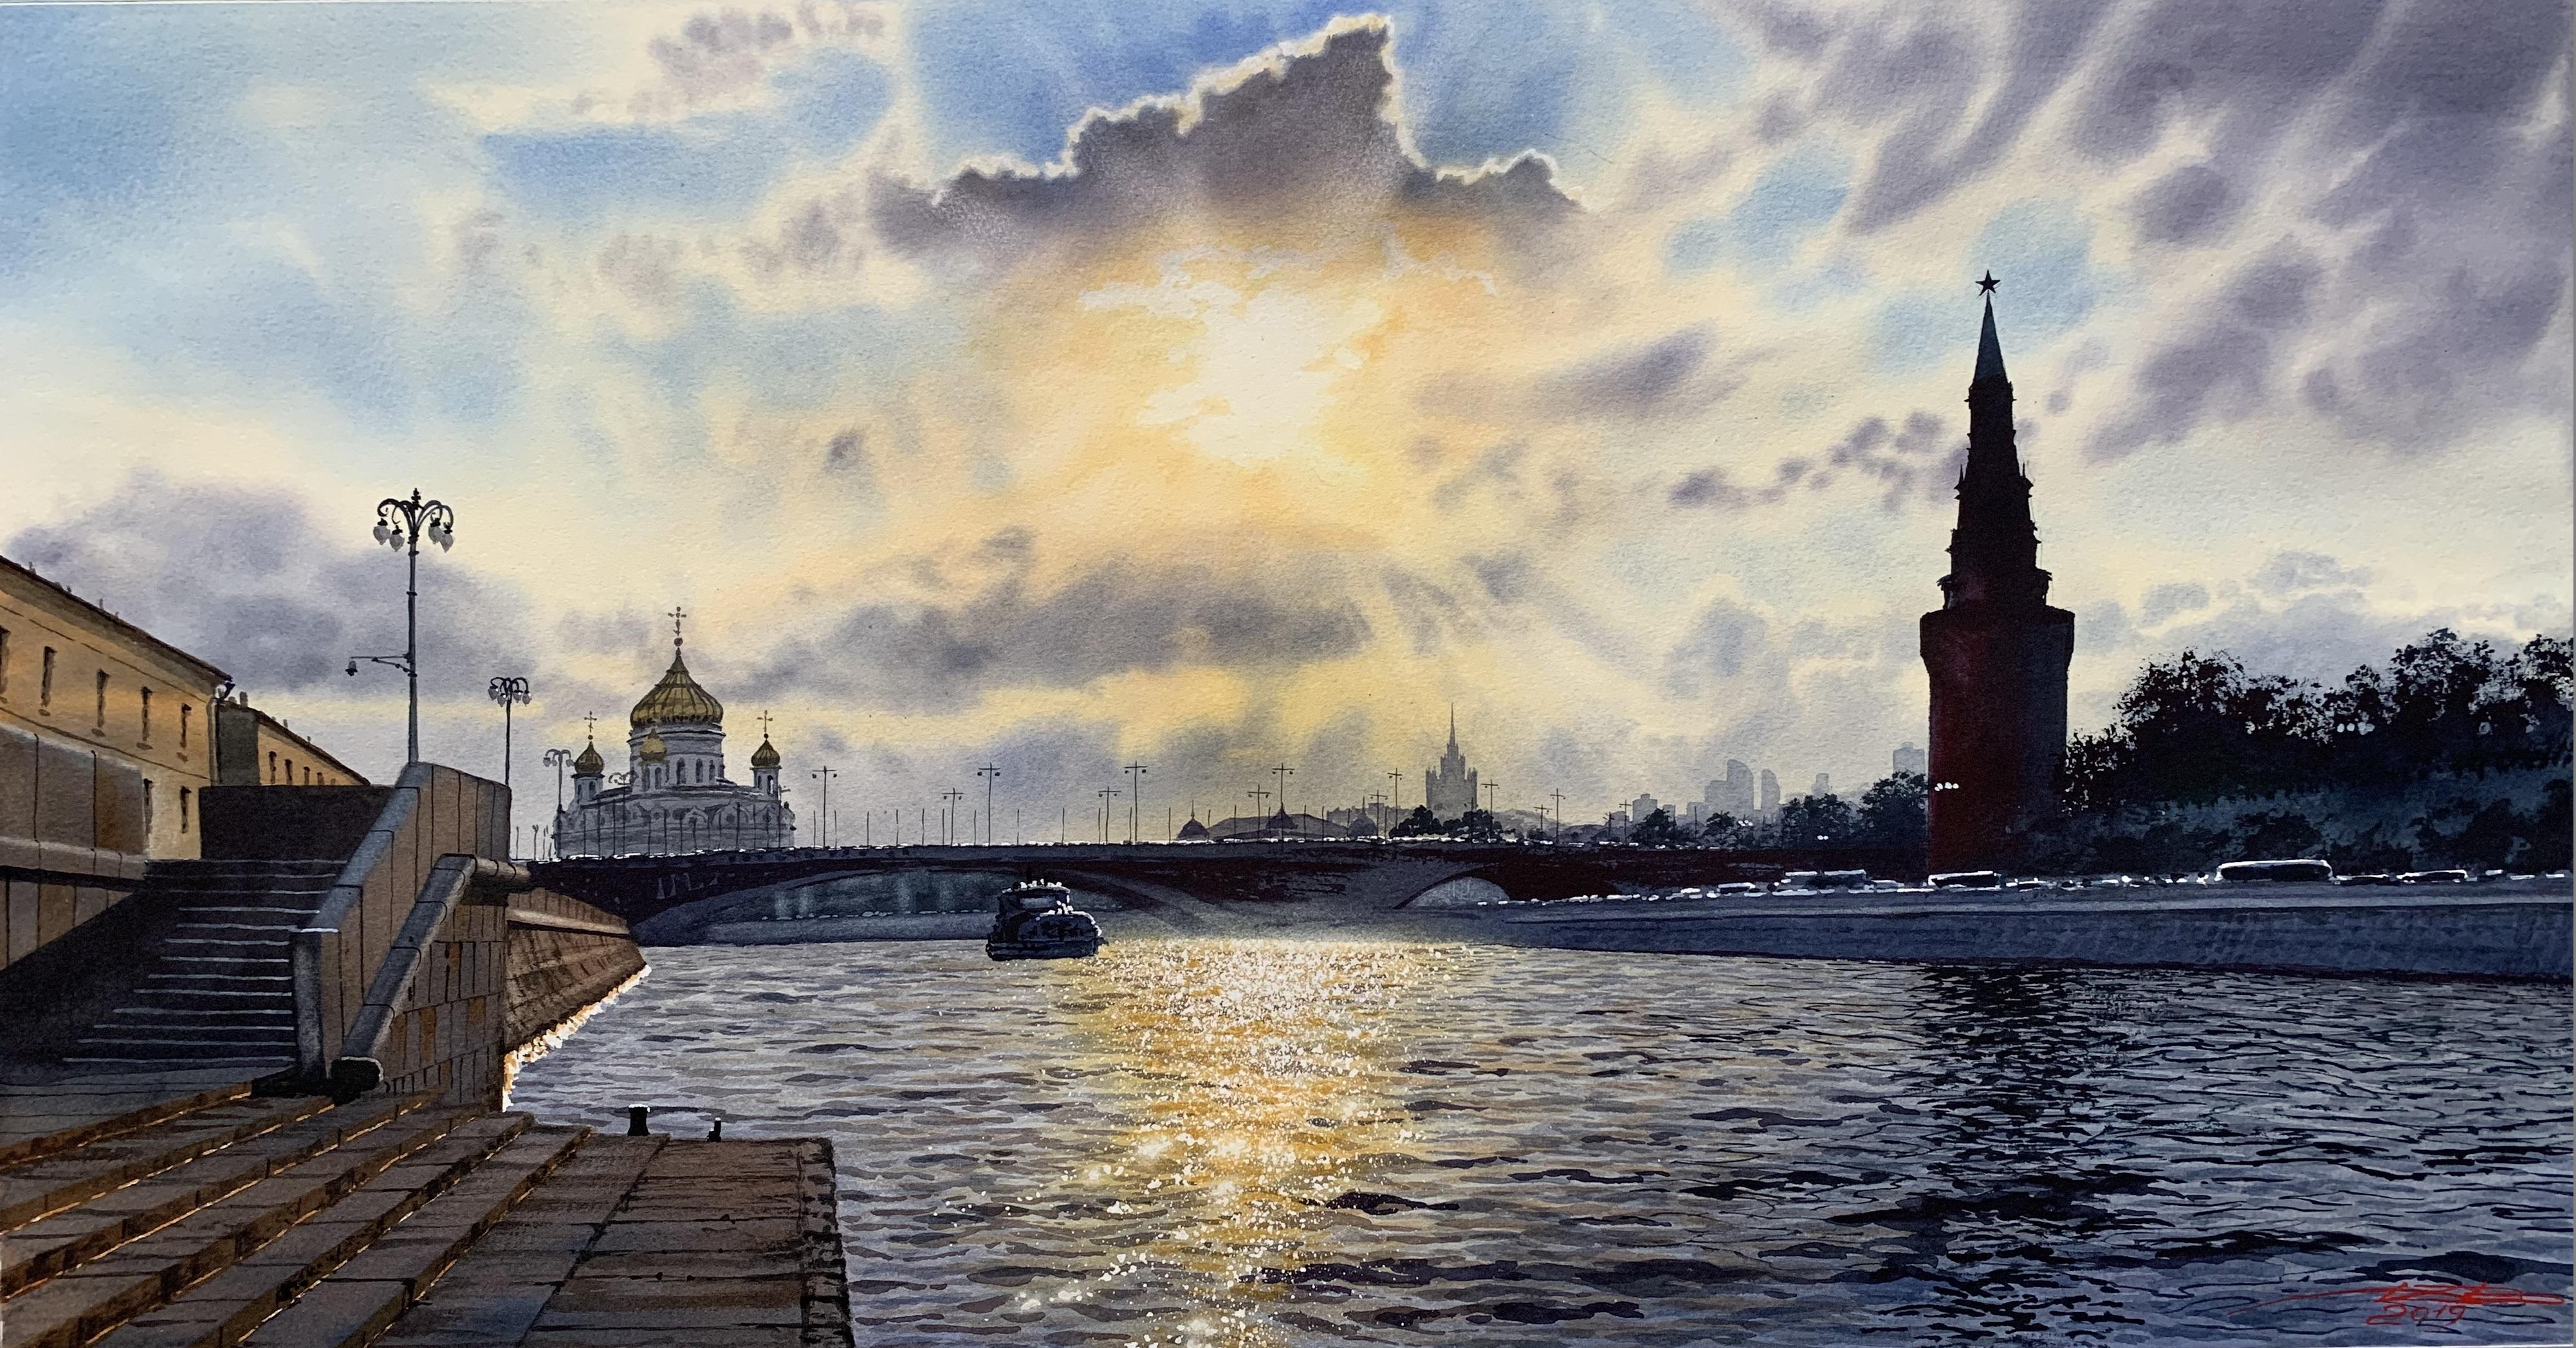 Moscow river. Kremlin.